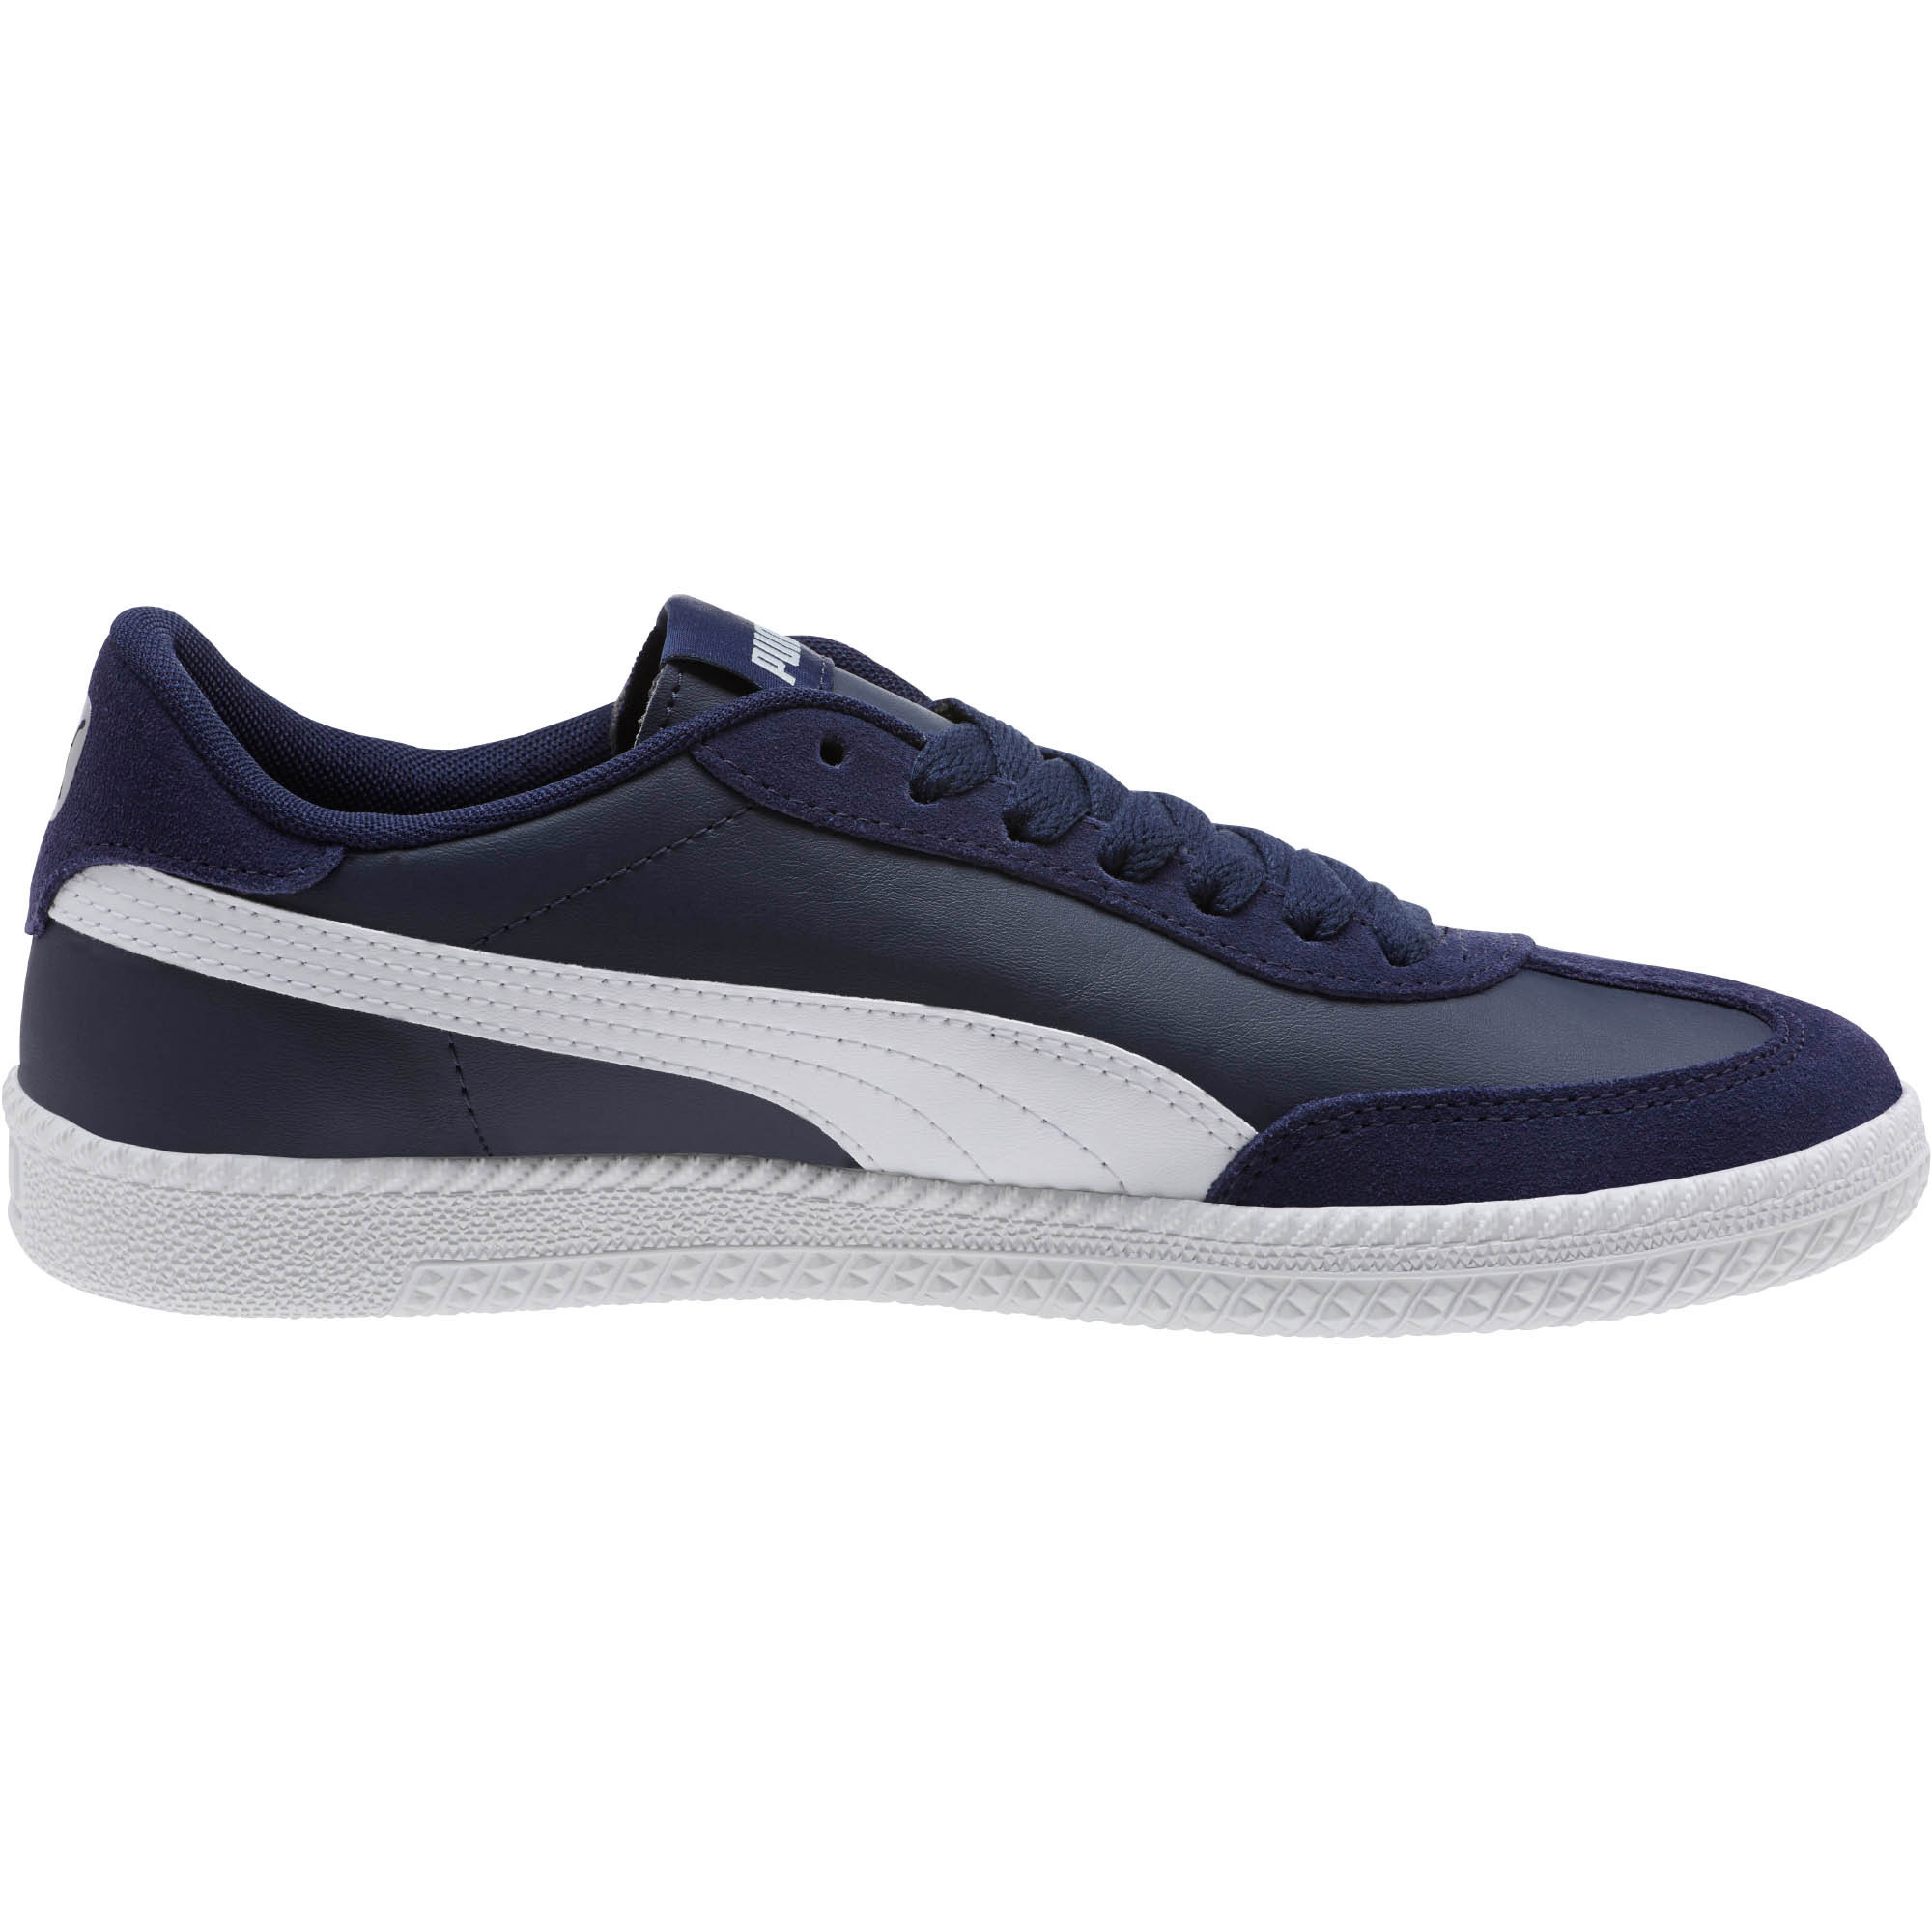 PUMA-Astro-Cup-Sneakers-Men-Shoe-Basics thumbnail 11